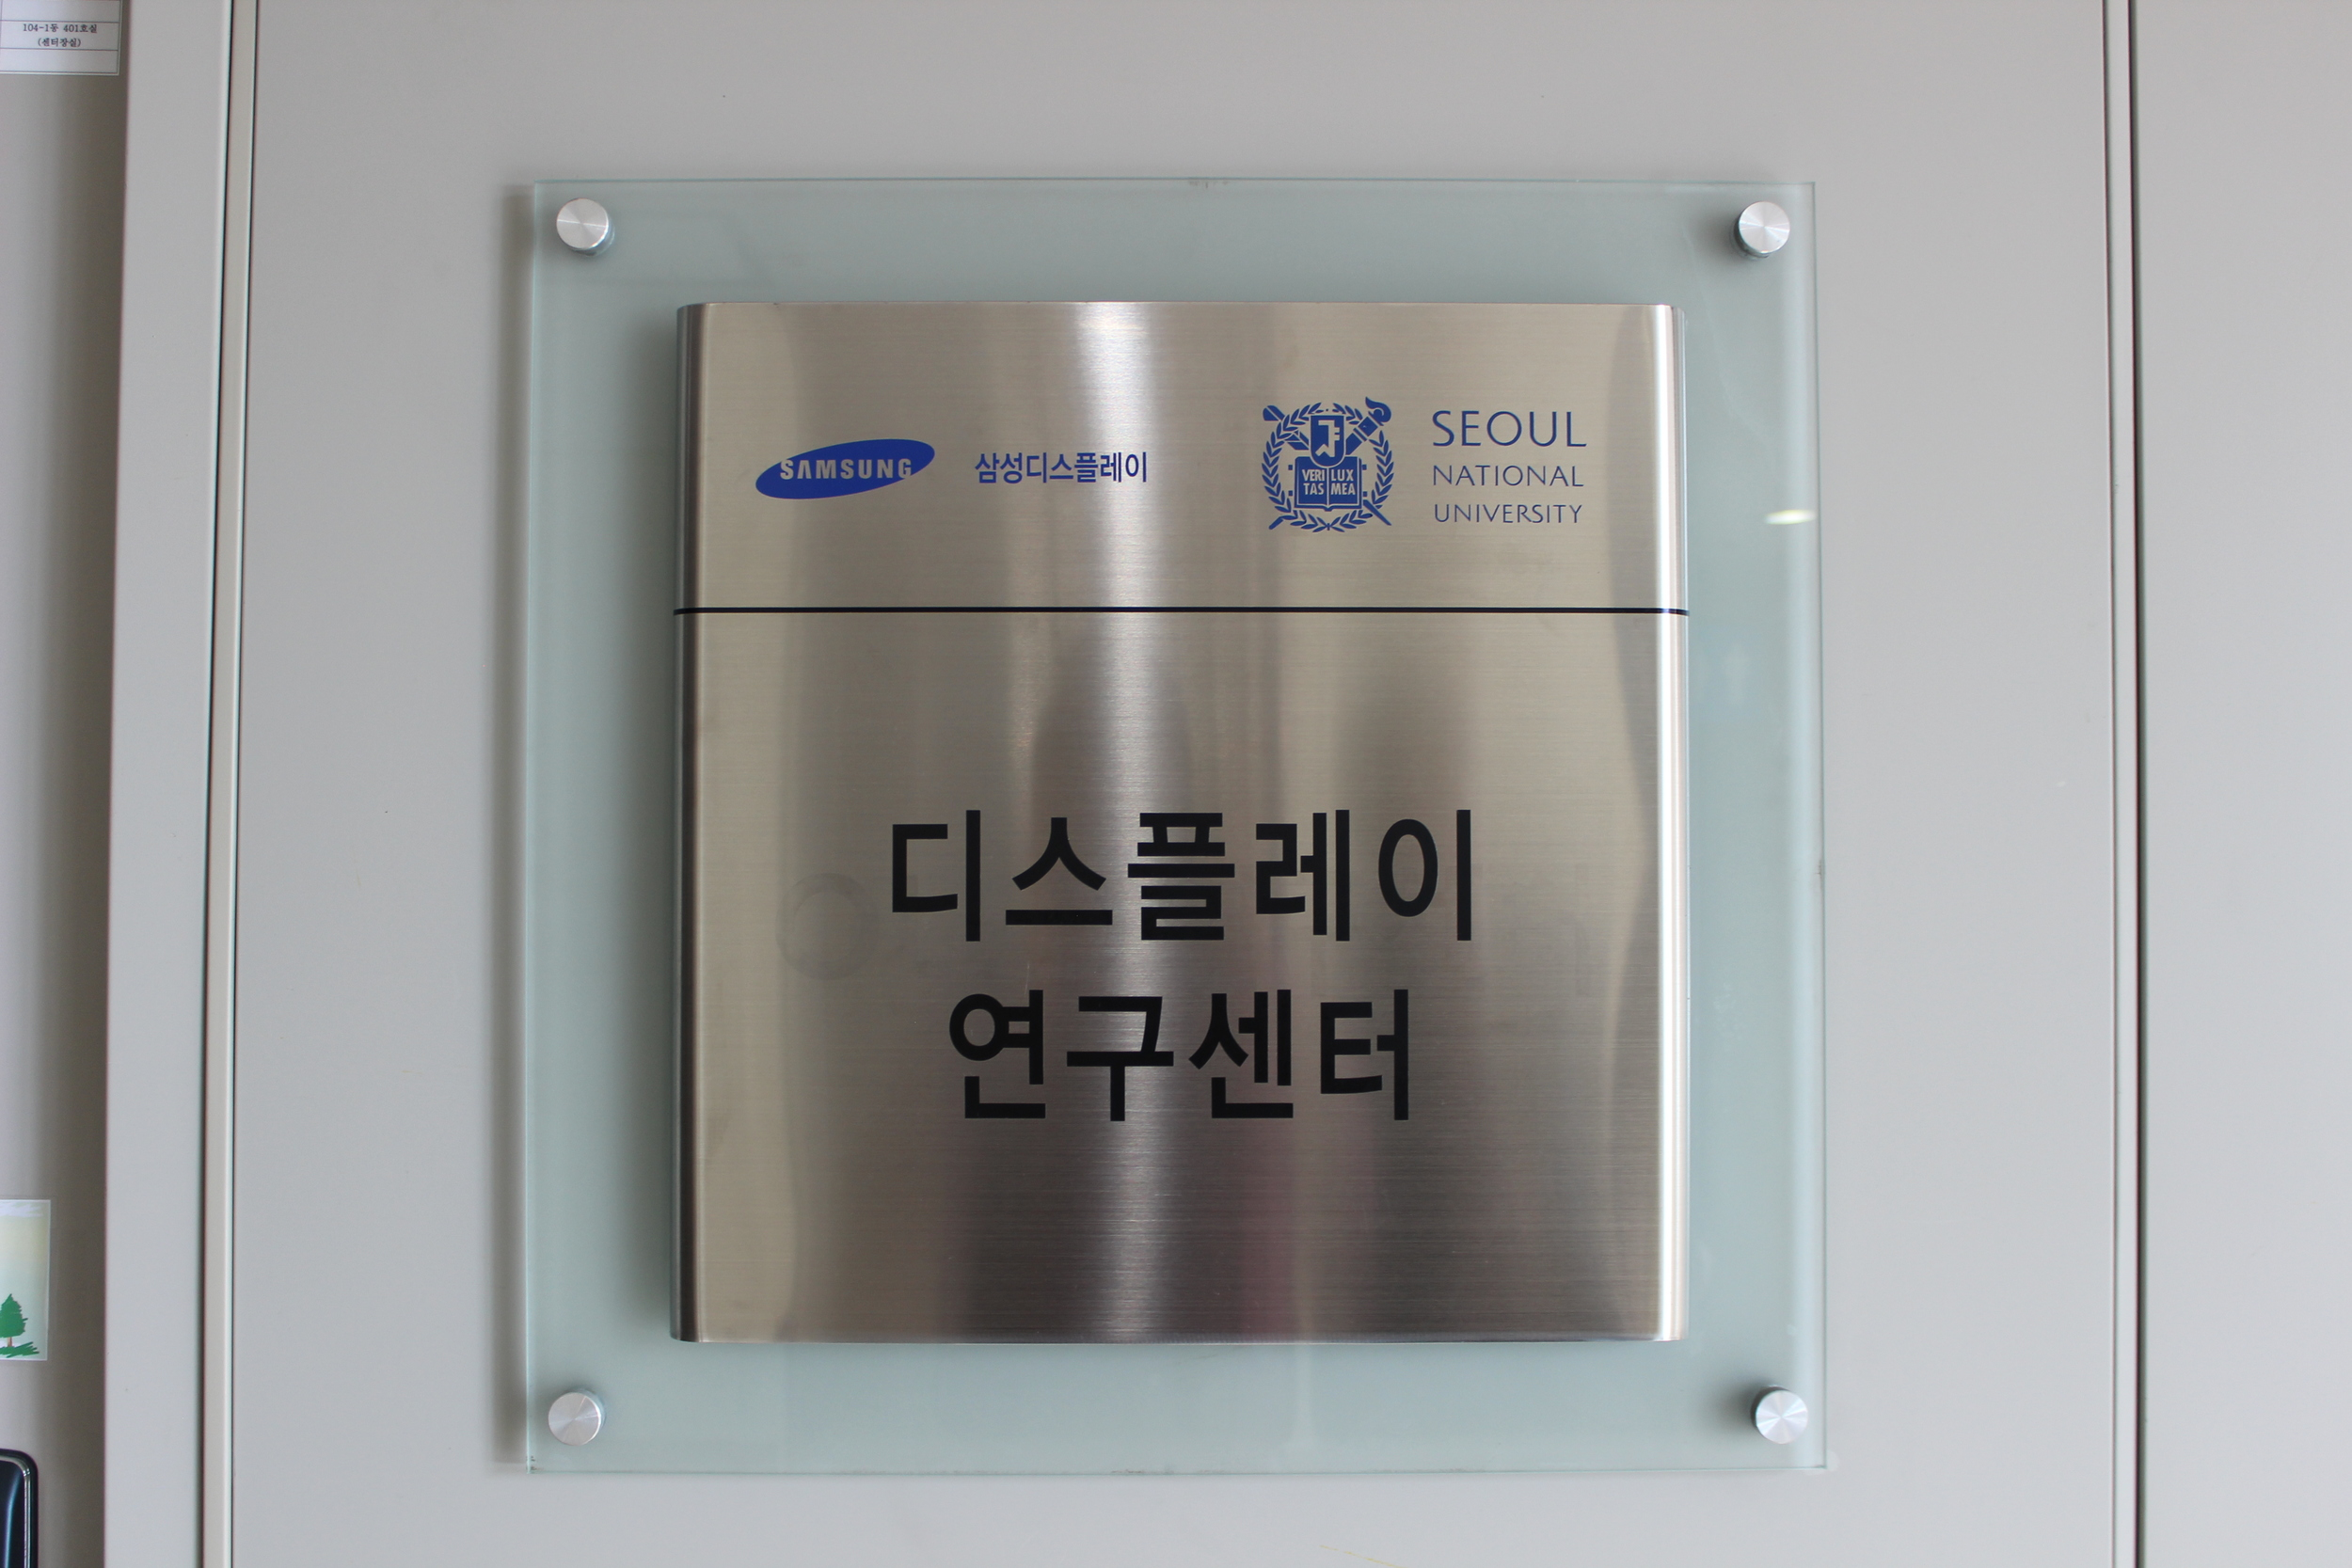 Seoul National University, Seoul, South Korea